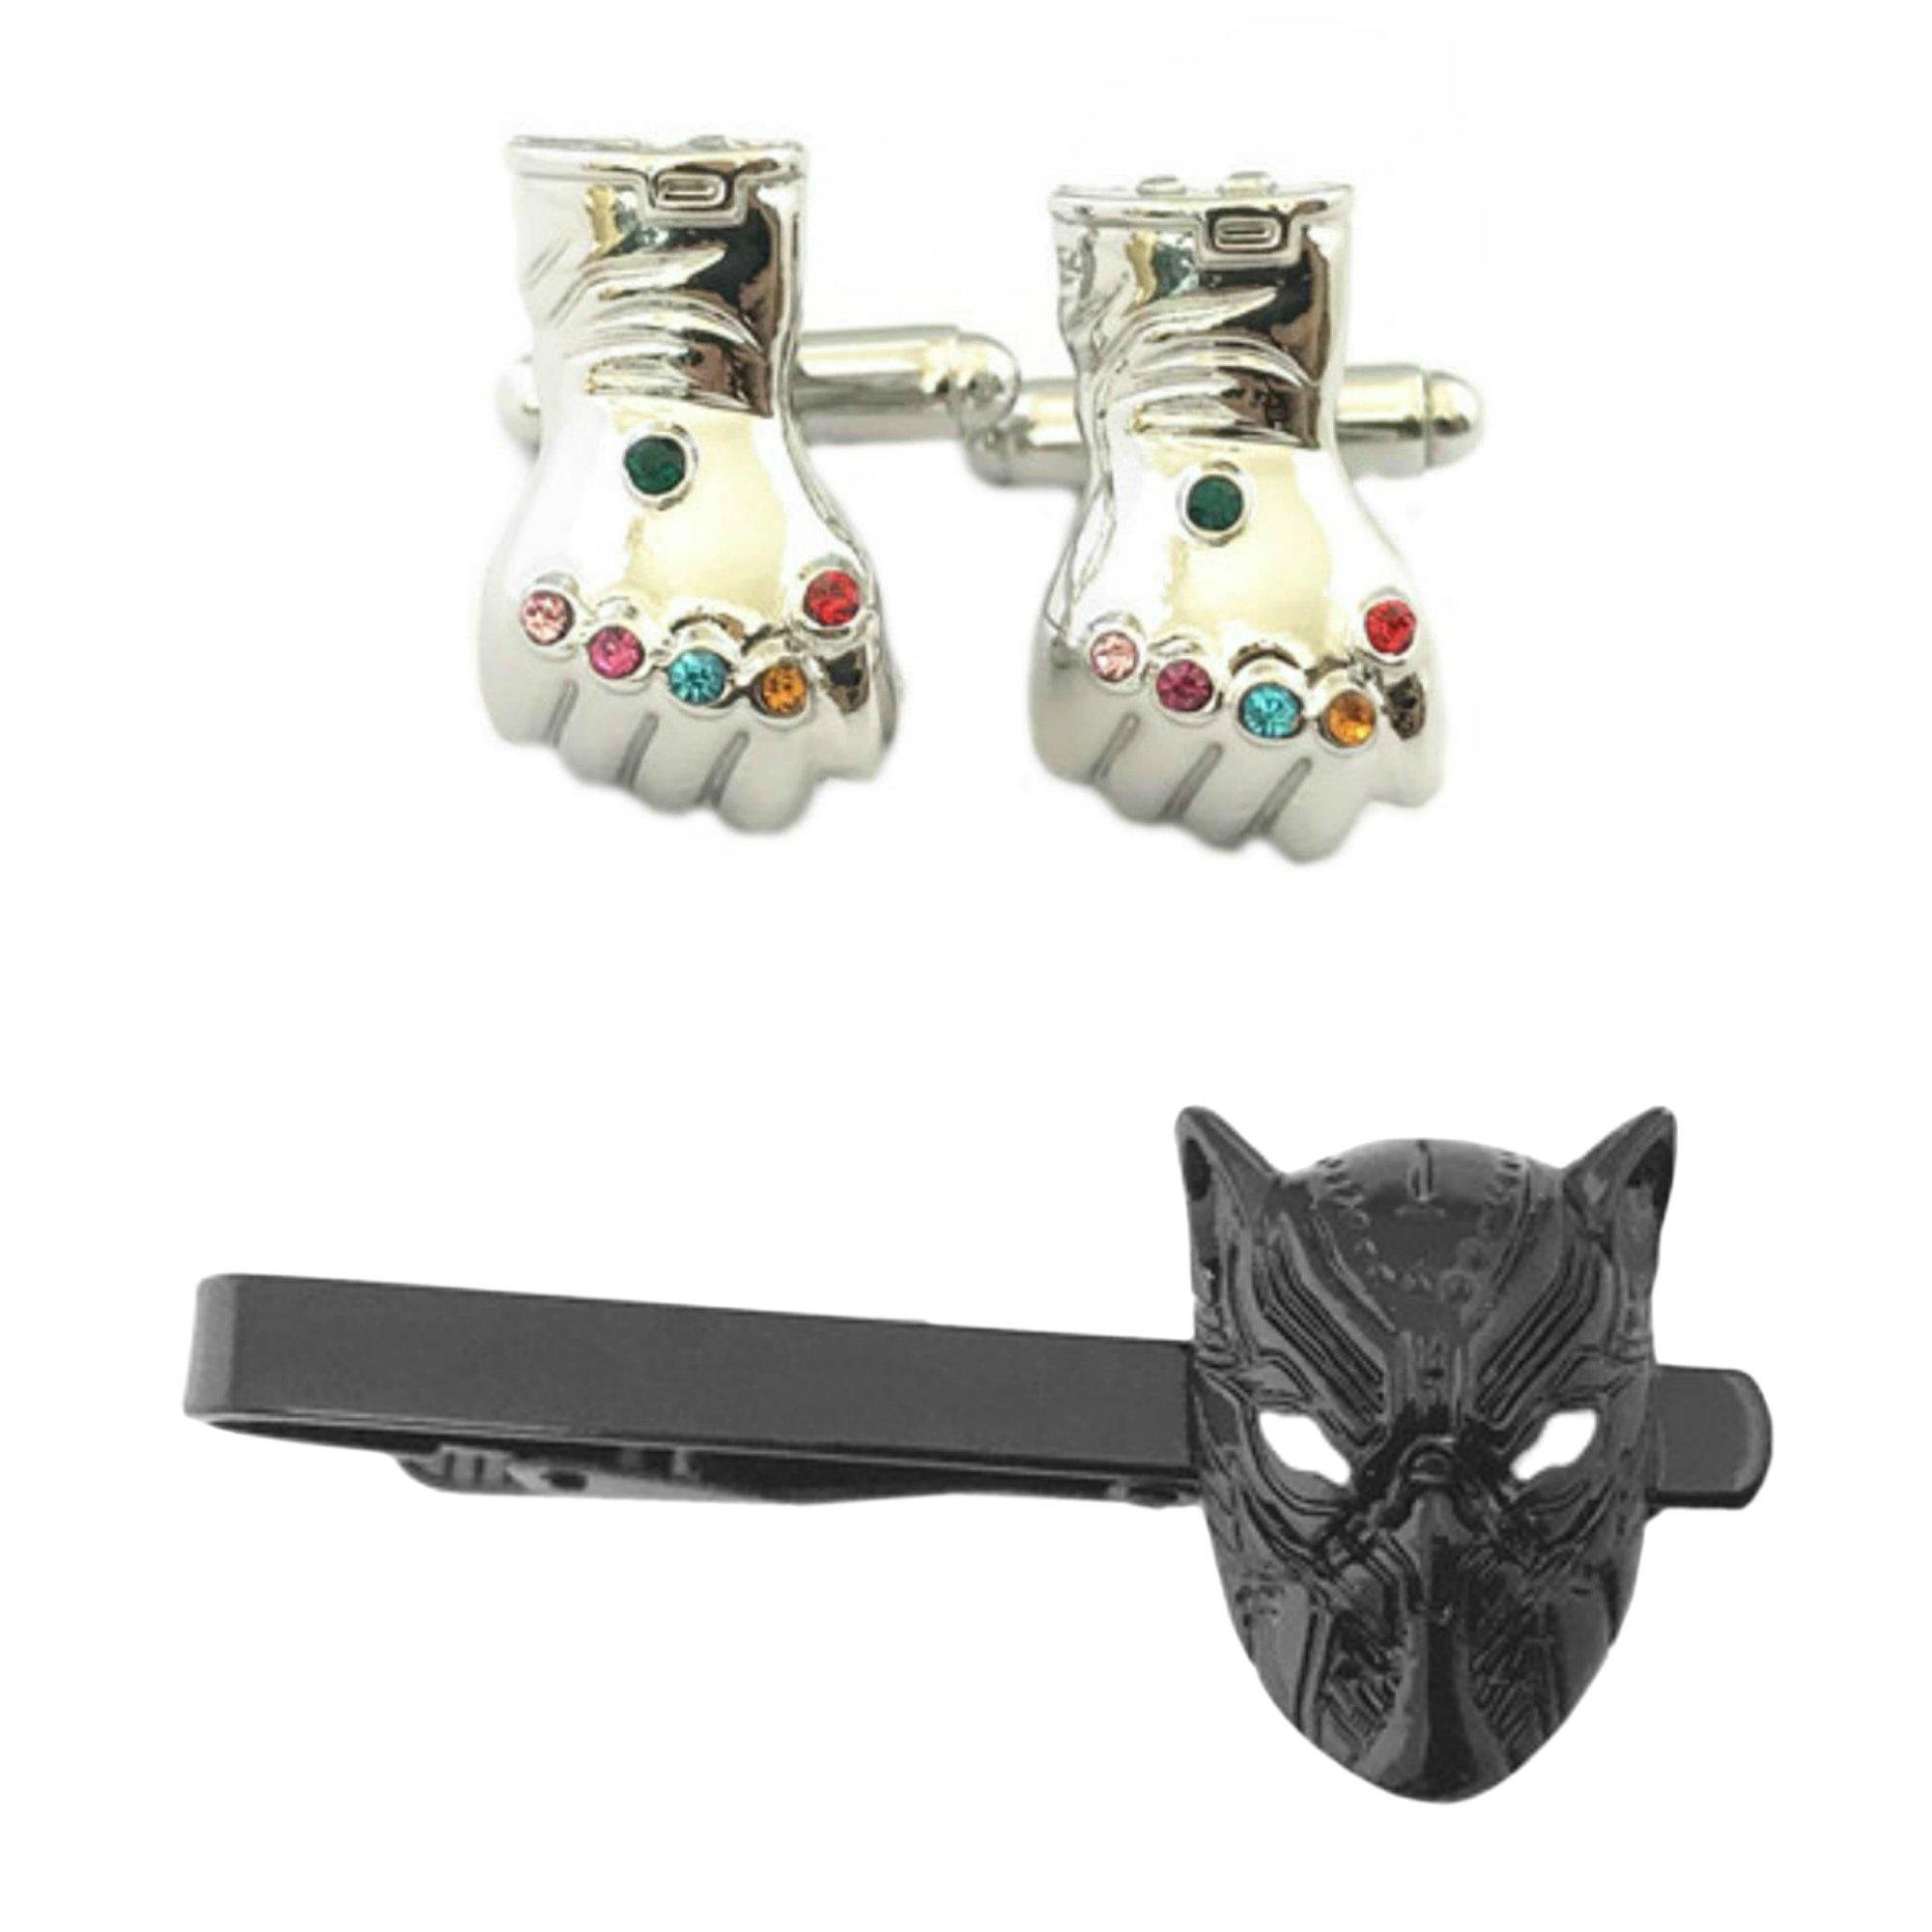 Outlander Thanos Cufflink & Killmonger Black Tiebar - New 2018 Marvel Studios Superhero Movies - Set of 2 Gift Set Wedding Logo Novelty Jewelry Series w/Gift Box